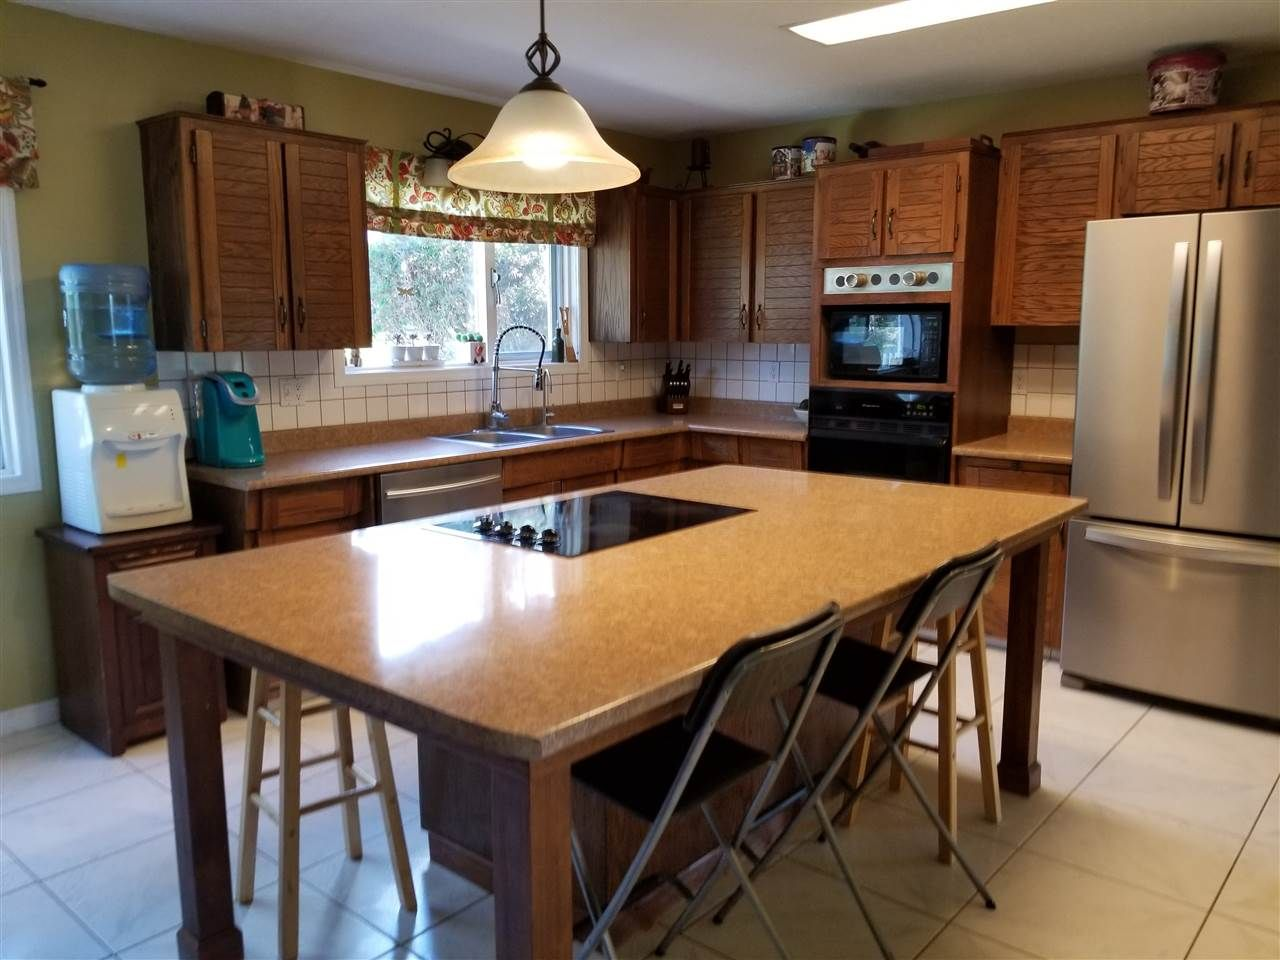 Photo 6: Photos: 511 TAMARACK Road in Williams Lake: Esler/Dog Creek House for sale (Williams Lake (Zone 27))  : MLS®# R2487403